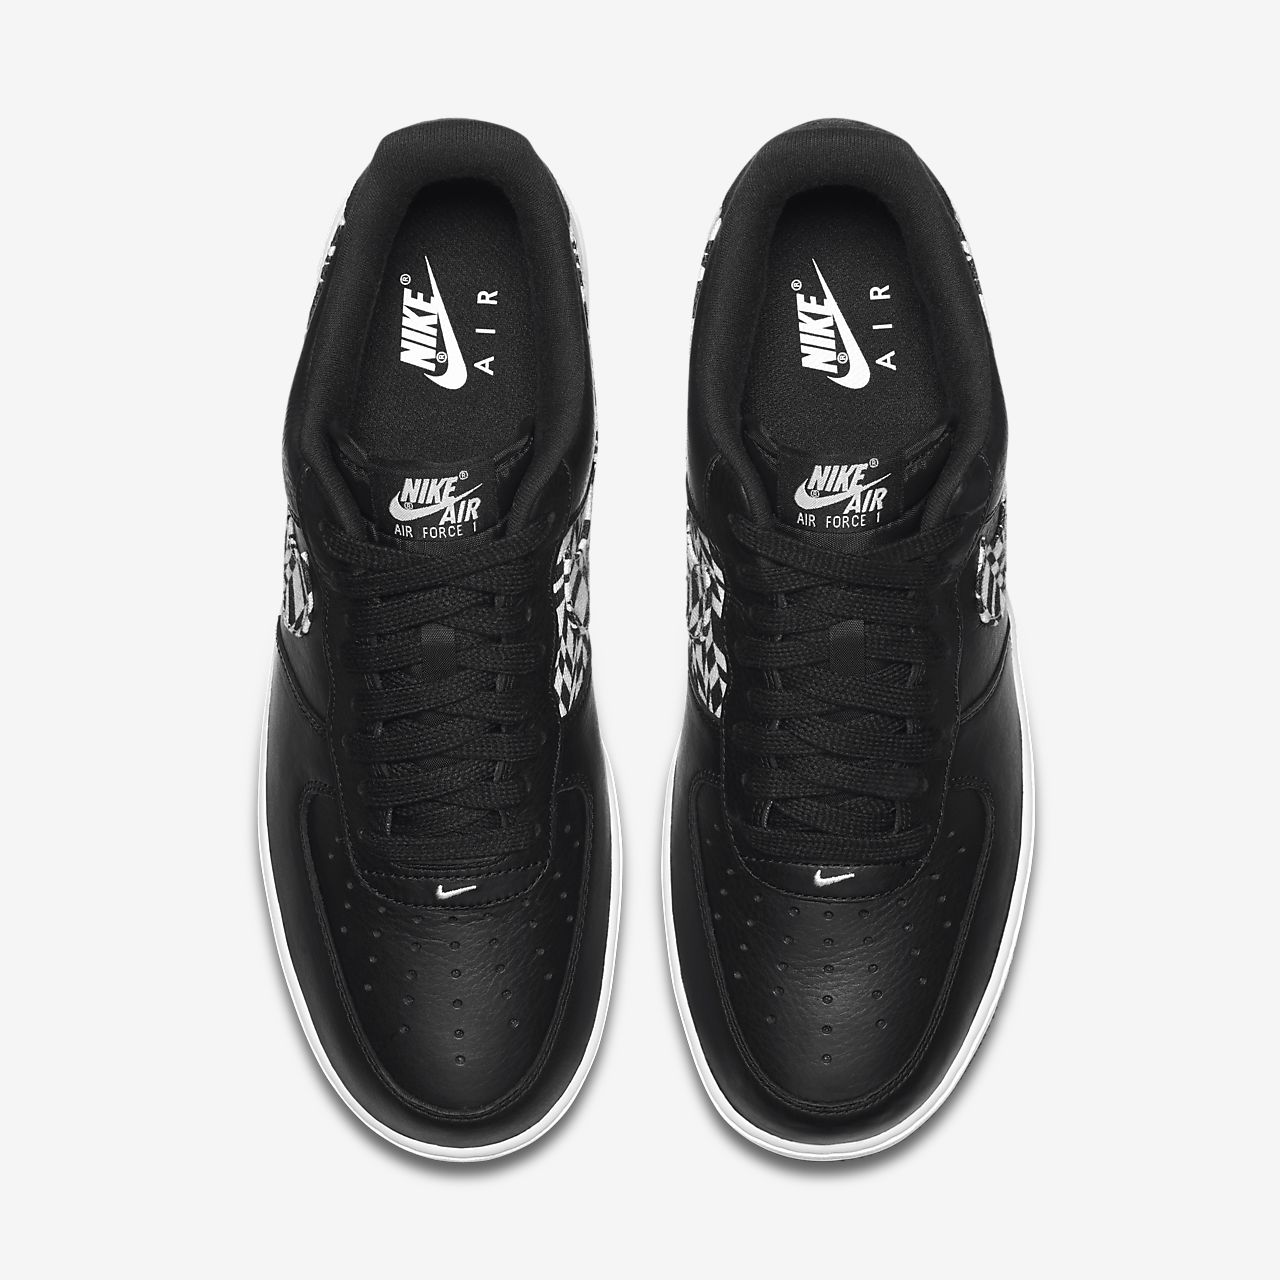 Hombres 1 Nike Air Force 1 Hombres Premium Cz 18a33d